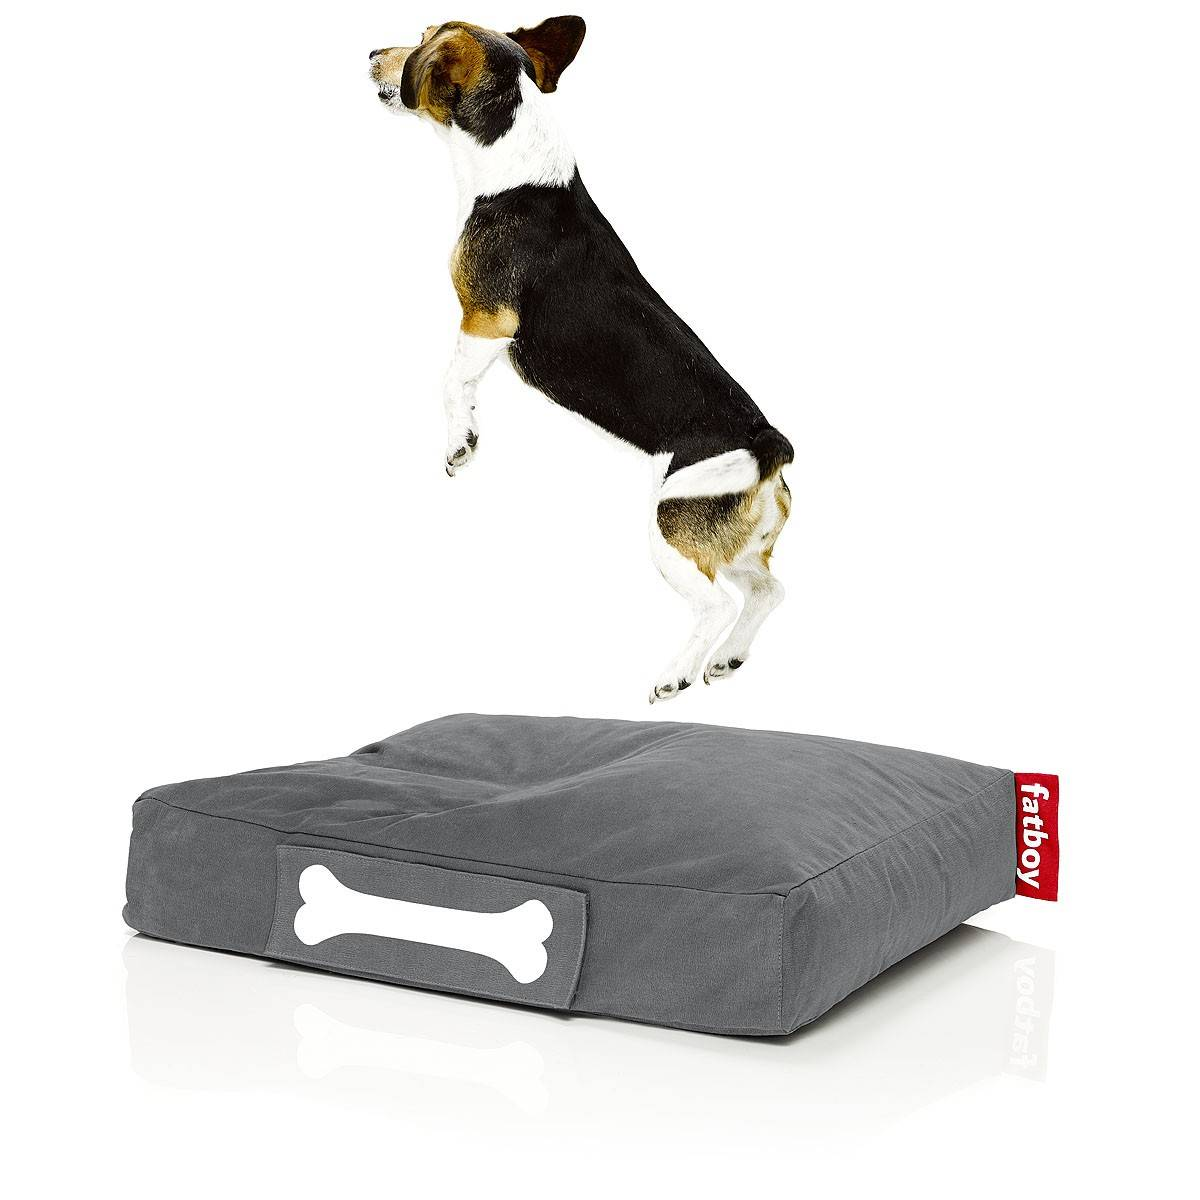 FATBOY sac pouf pour chiens et chats DOGGIELOUNGE STONEWASHED SMALL (Gris - 100% Coton)